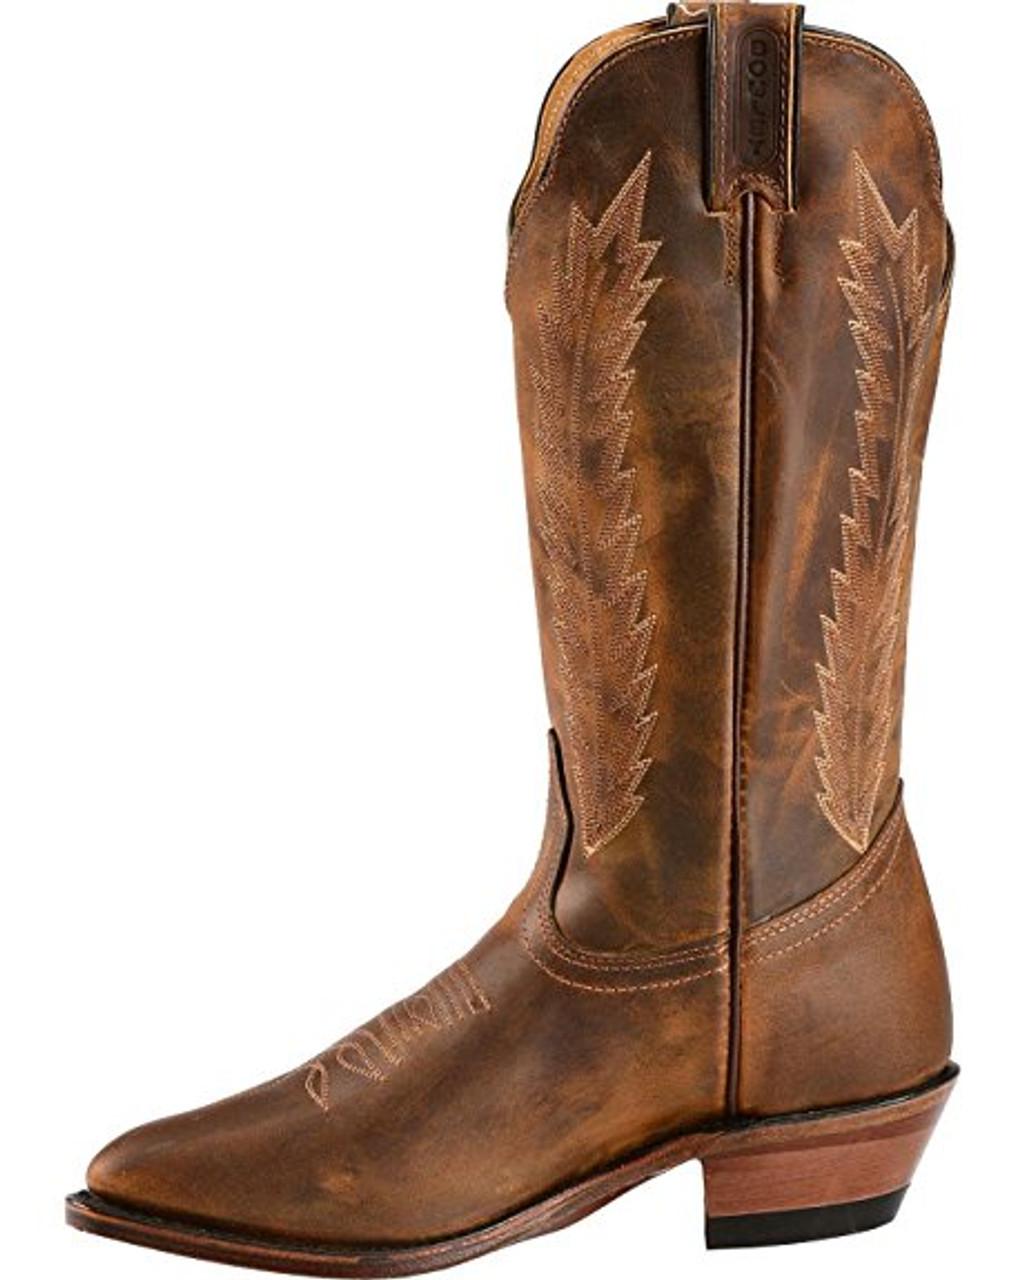 47305aa62 Boulet Women's Tan Western Cowgirl Boots 9026 - Jackson's Western